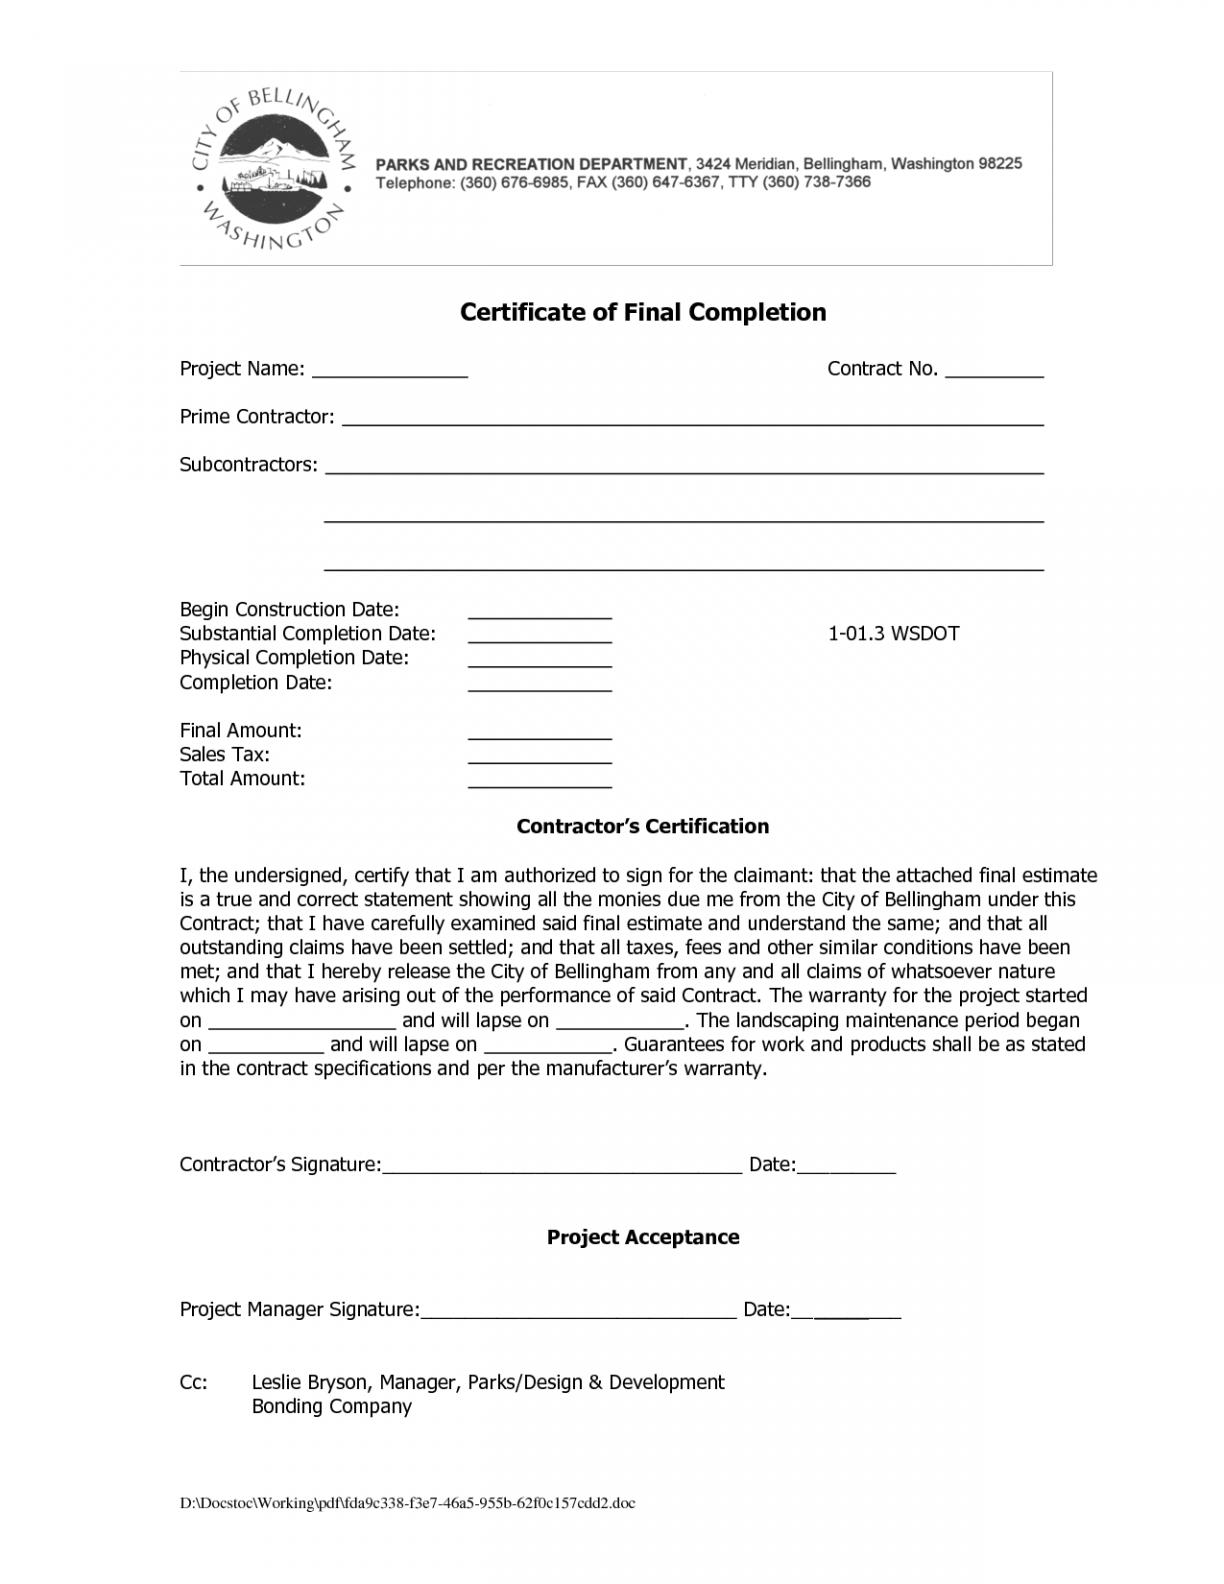 Certificate Of Work Completion Templates  – Elsik Blue Cetane Regarding Certificate Of Substantial Completion Template